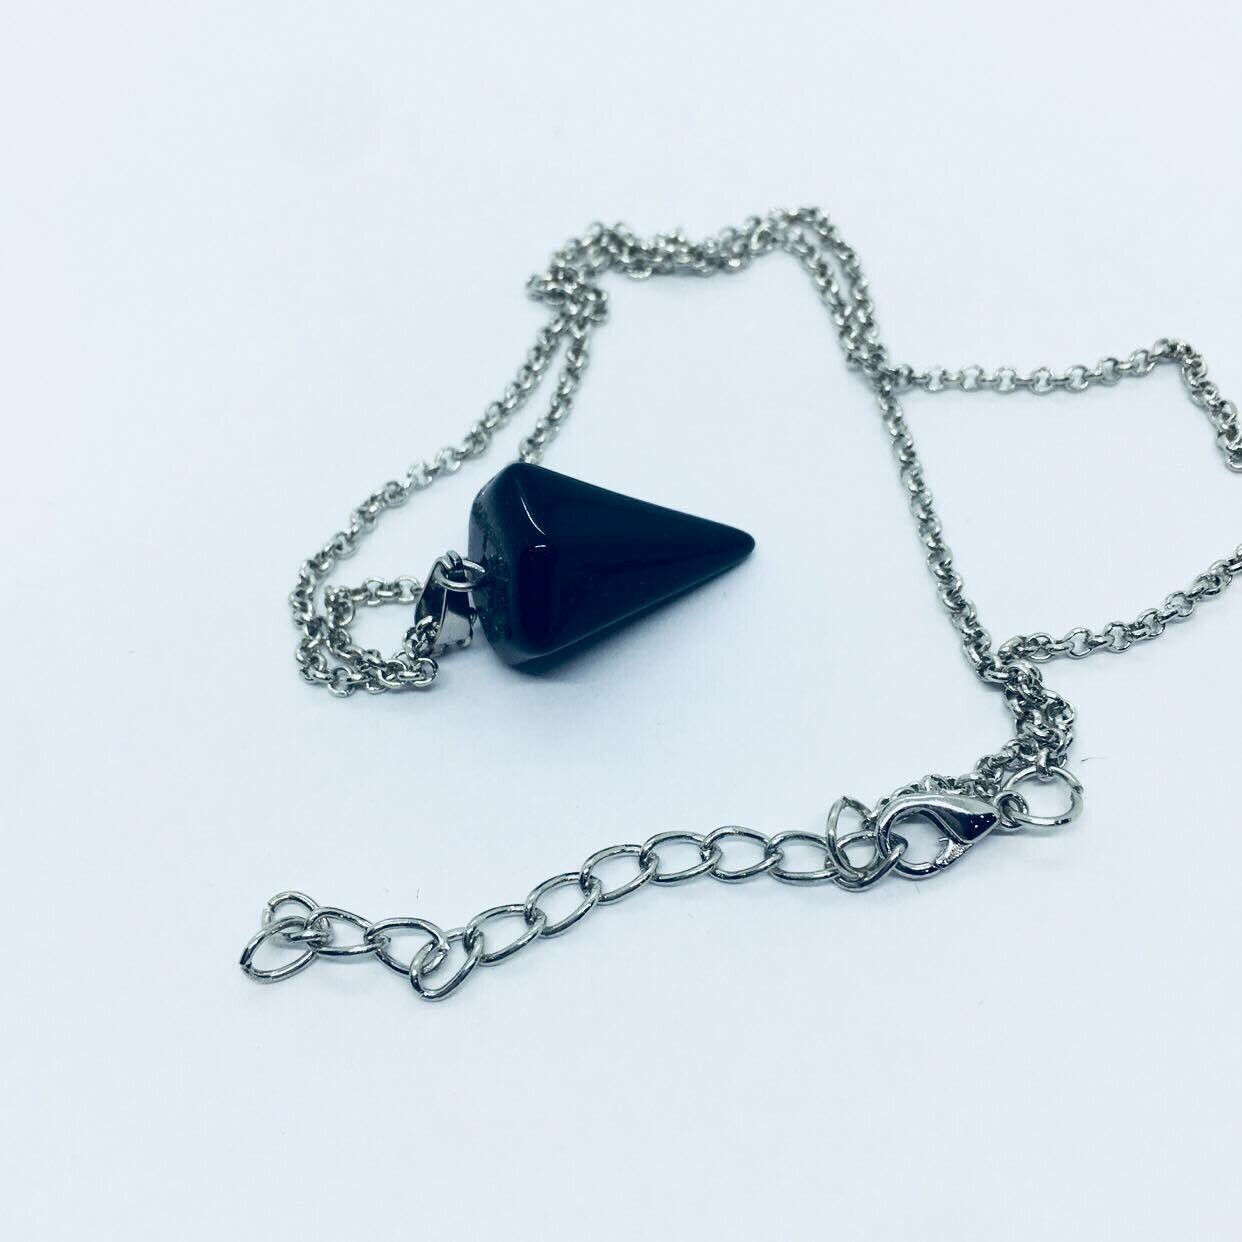 Pendulum Necklace-Black Agate